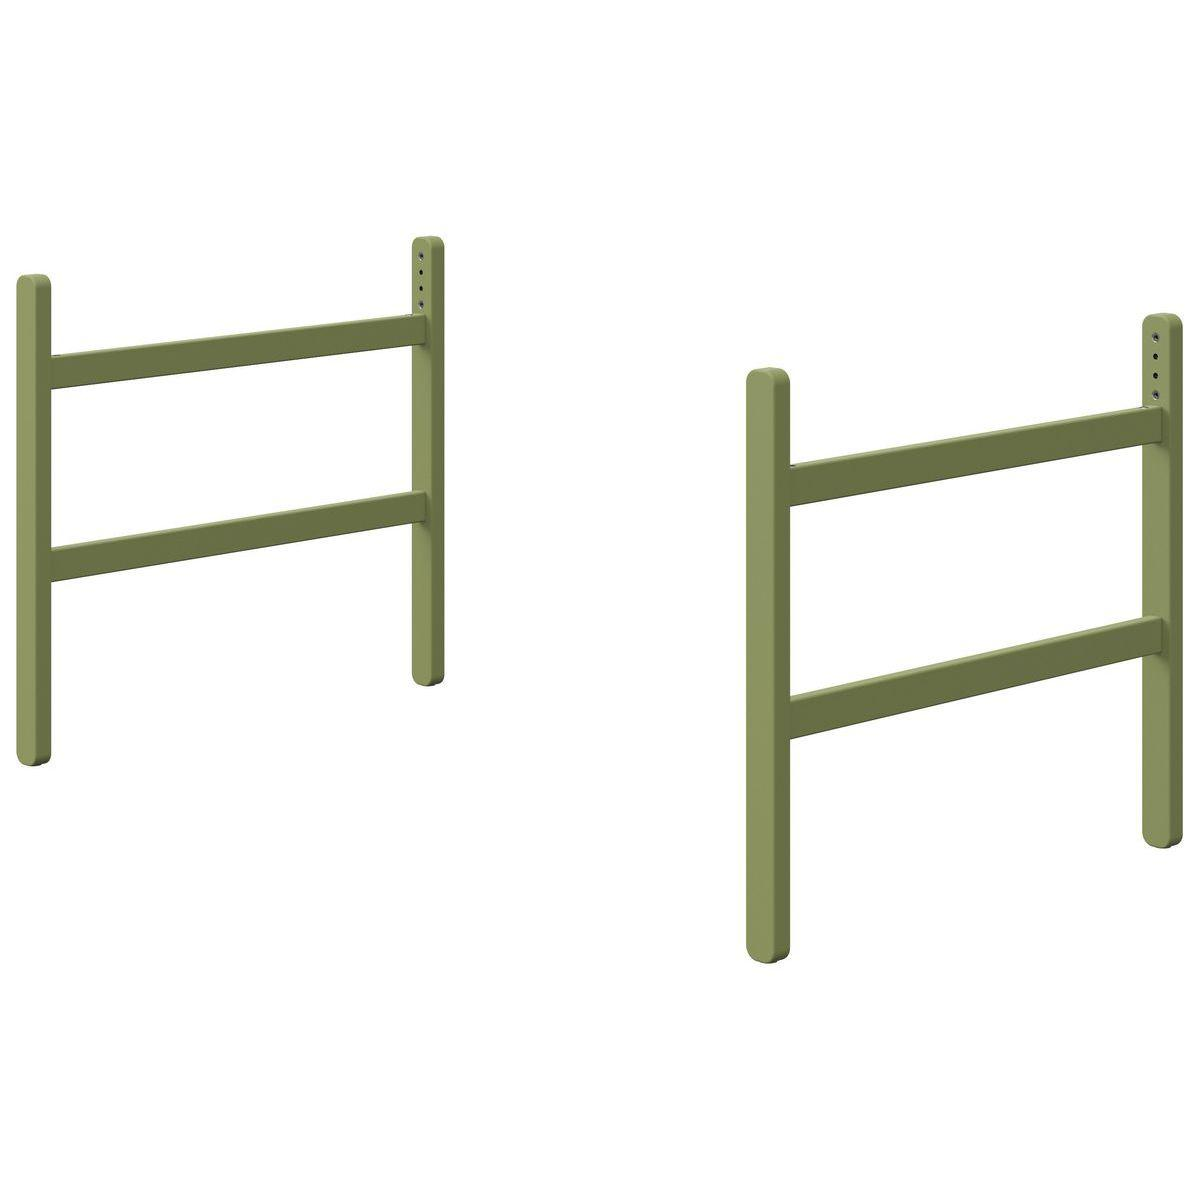 Patas cama media alta POPSICLE Flexa kiwi